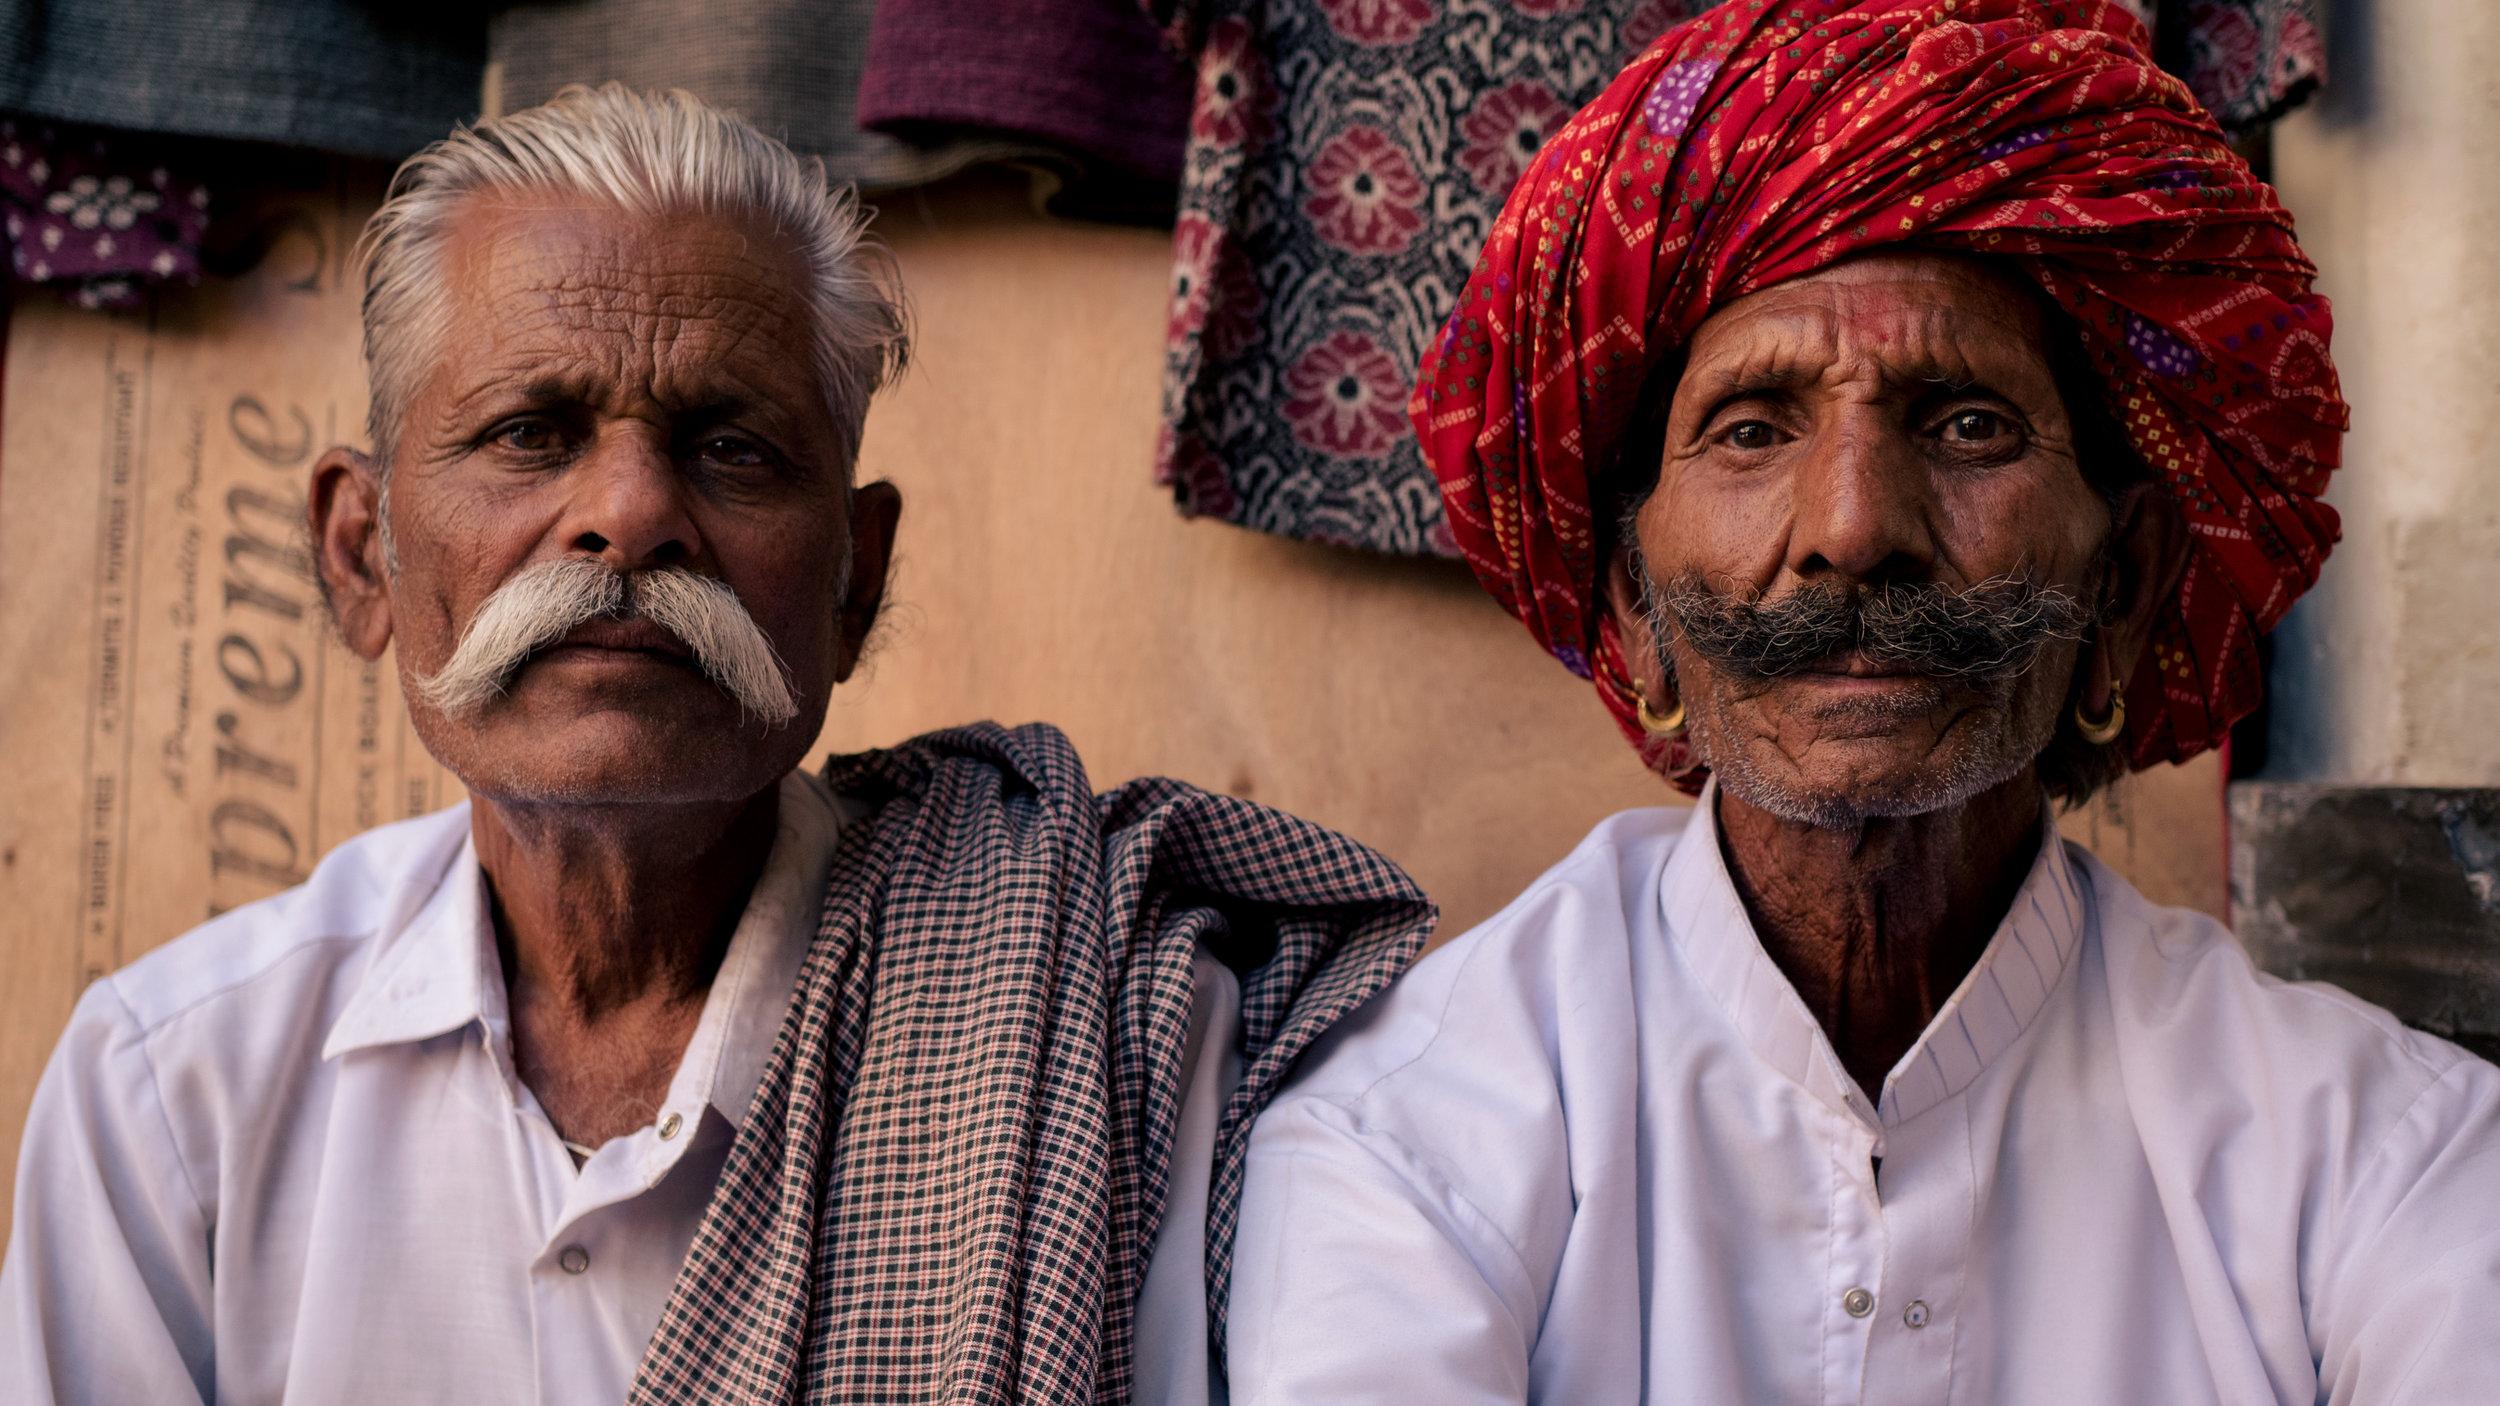 Salt & Pepper (Pushkar, Rajasthan)